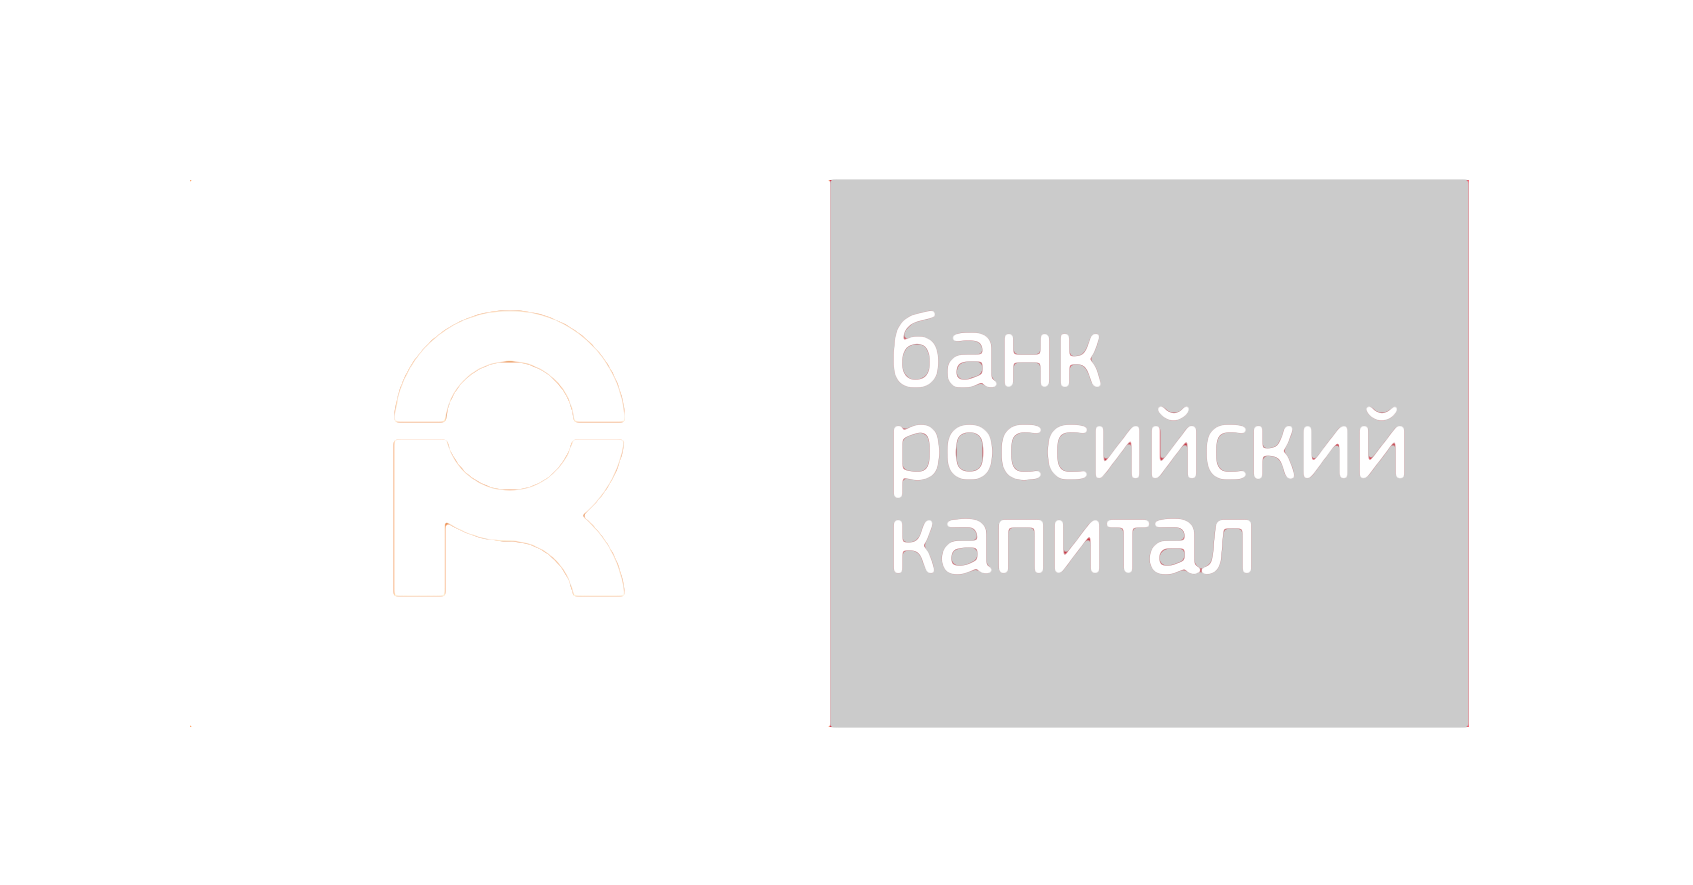 Корпоративный КВН Российский капитал